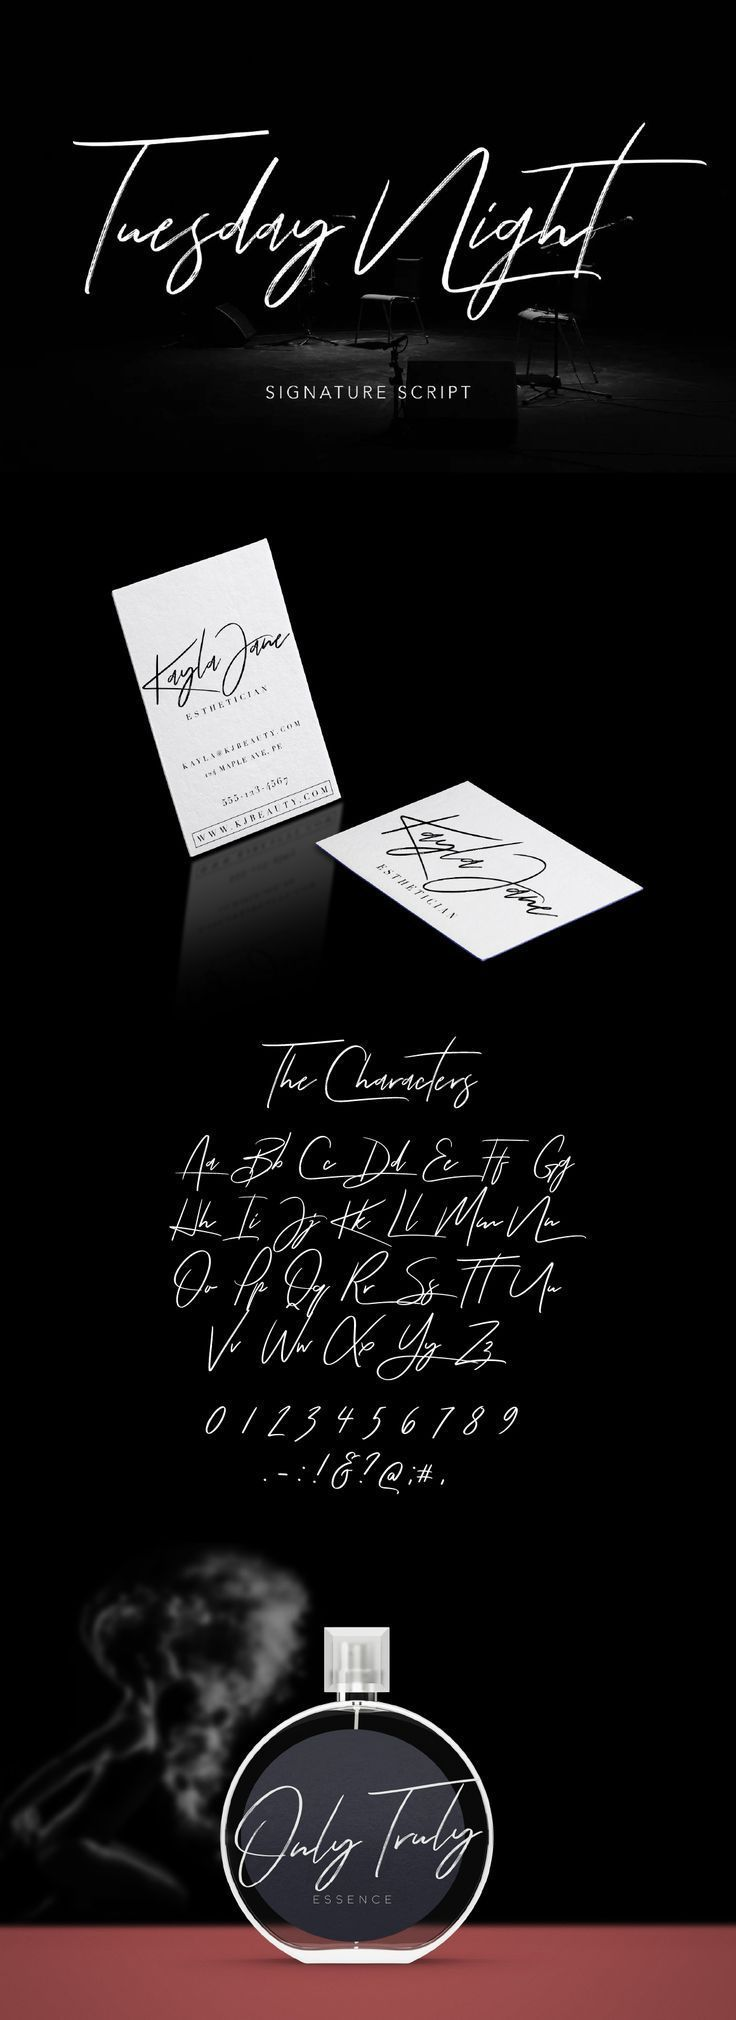 TUESDAY NIGHT FREE SIGNATURE SCRIPT Signature fonts